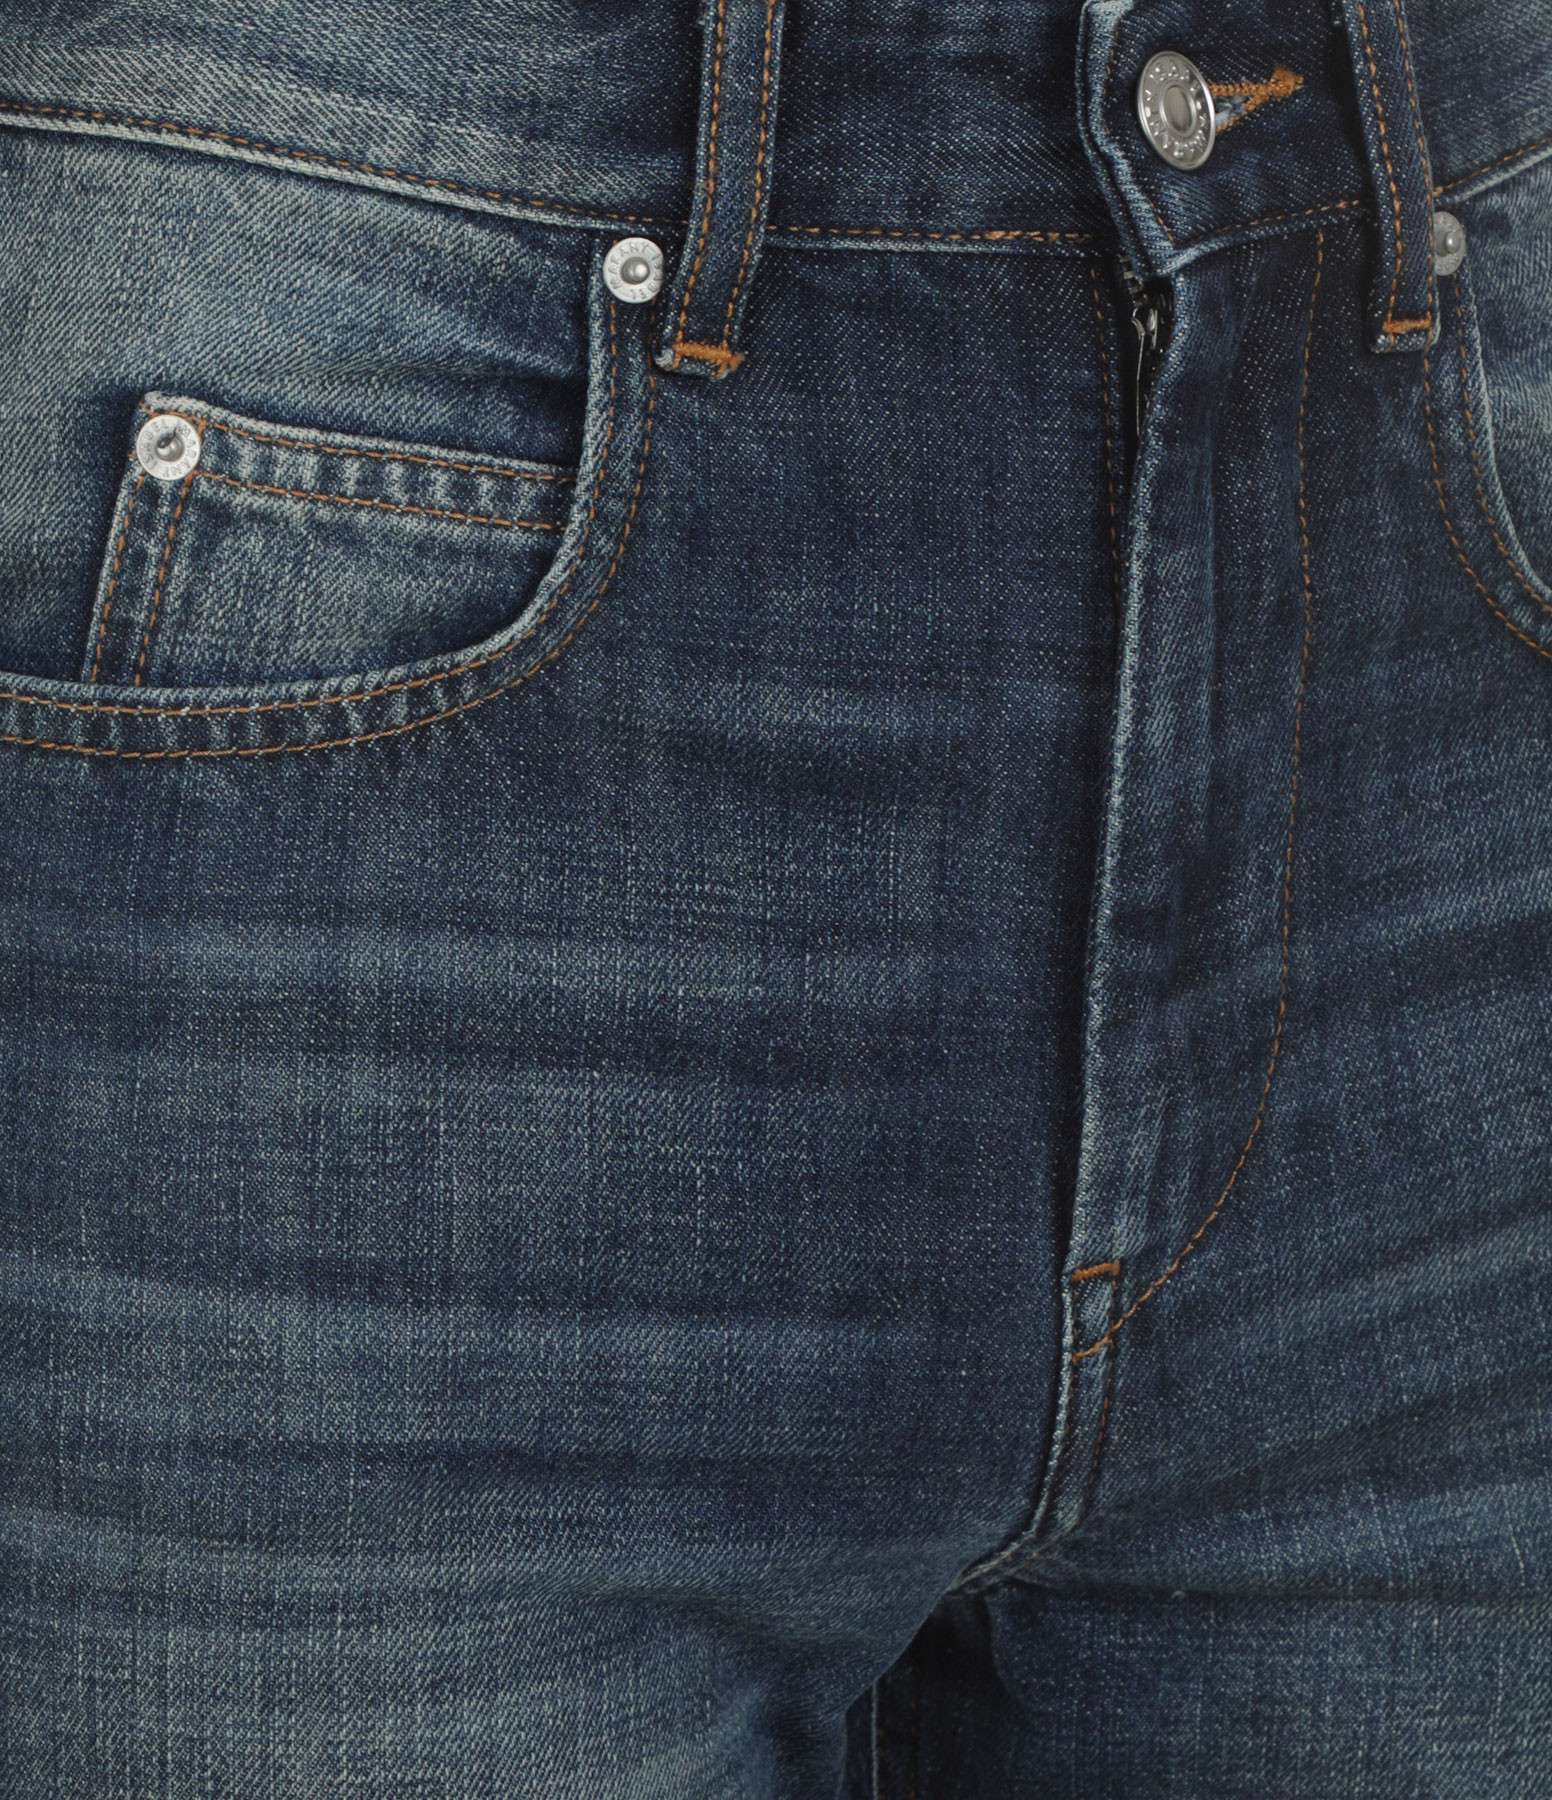 ISABEL MARANT ÉTOILE - Pantalon Belvira Coton Bleu